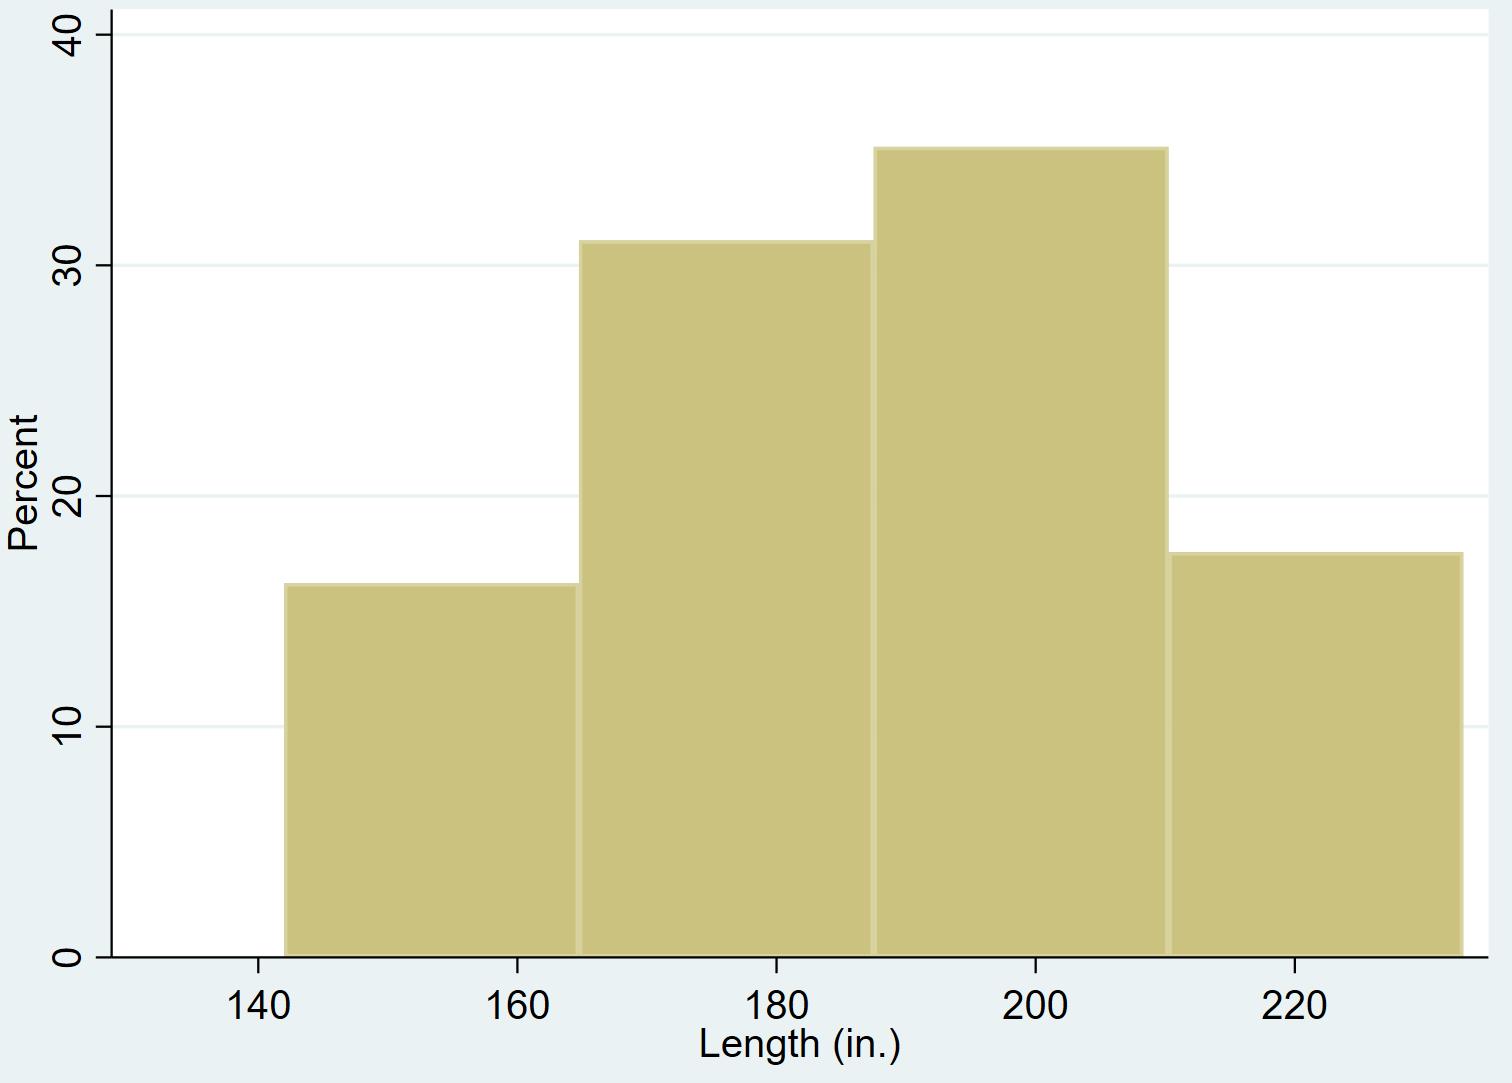 Stata histogram with 4 bins